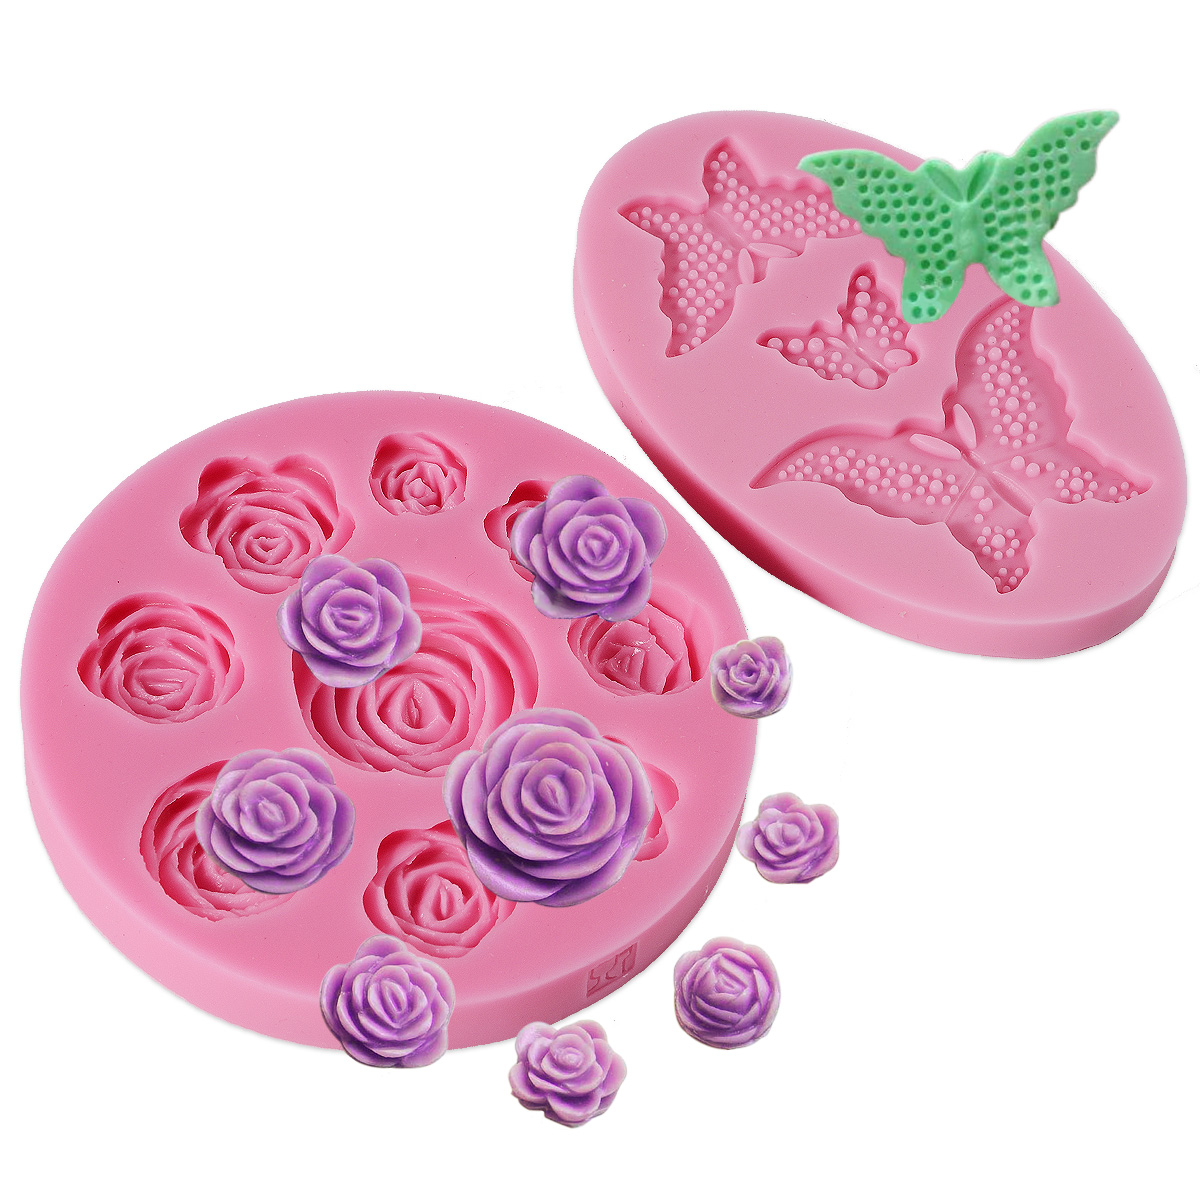 Molde silicona fondant bordes de mariposa y rosa para decorar tarta pastel ebay - Moldes silicona amazon ...